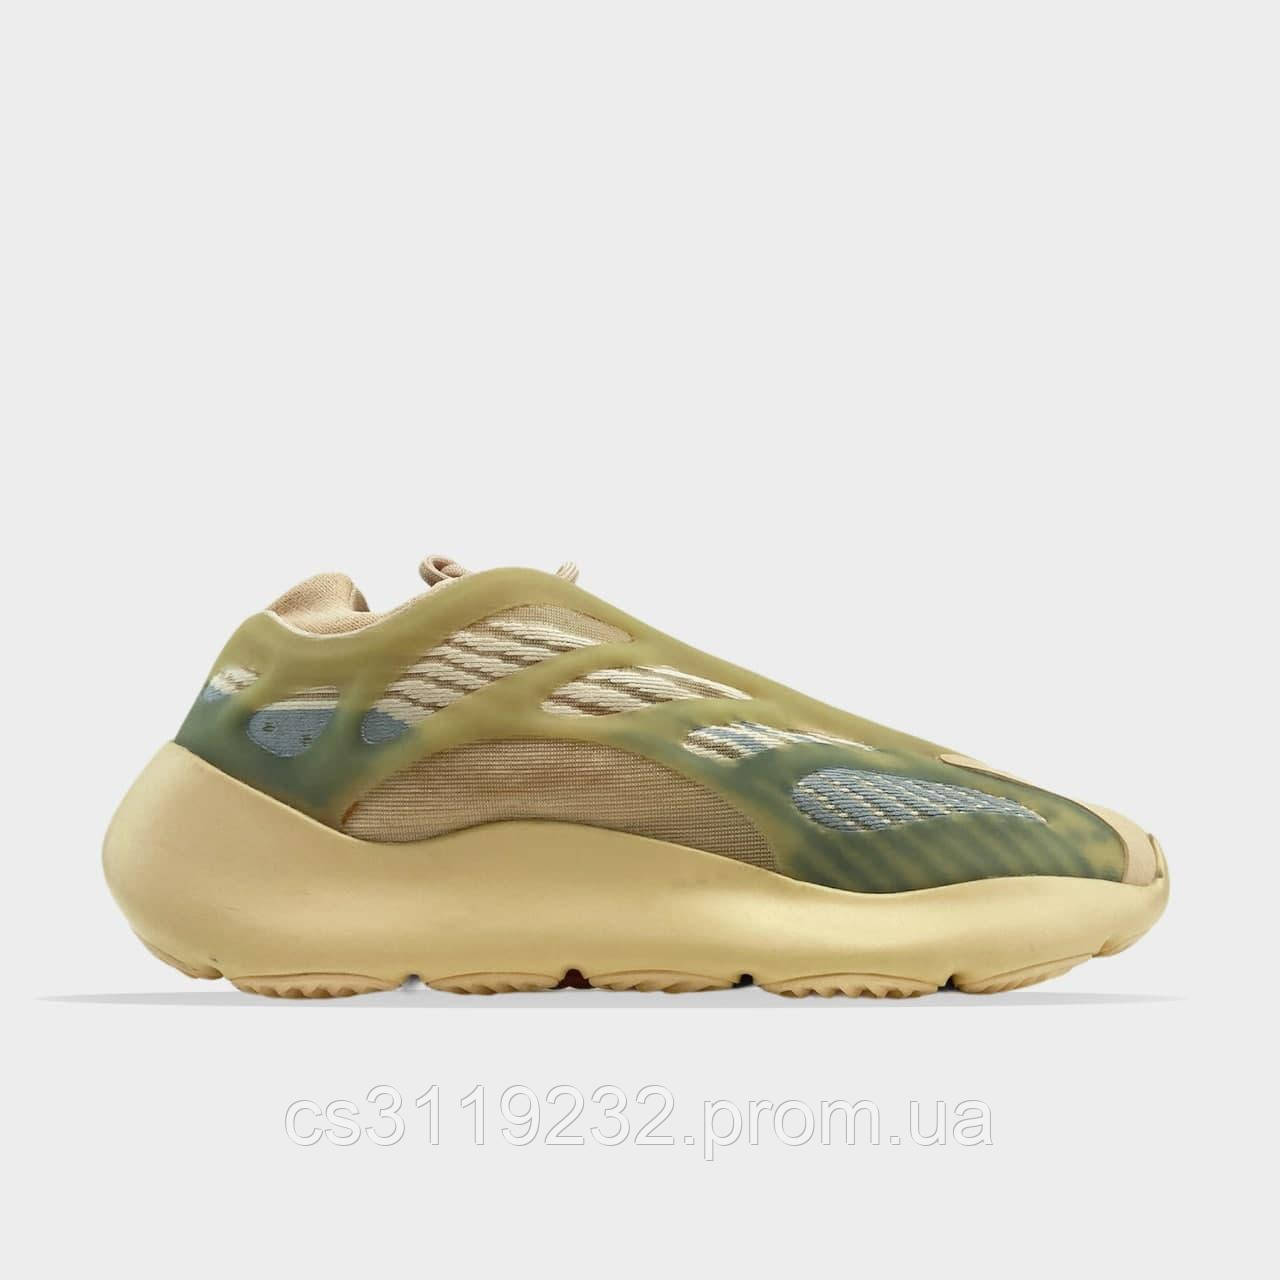 Жіночі кросівки Adidas Yeezy Boost 700 V3 Azael Peach (бежеві)